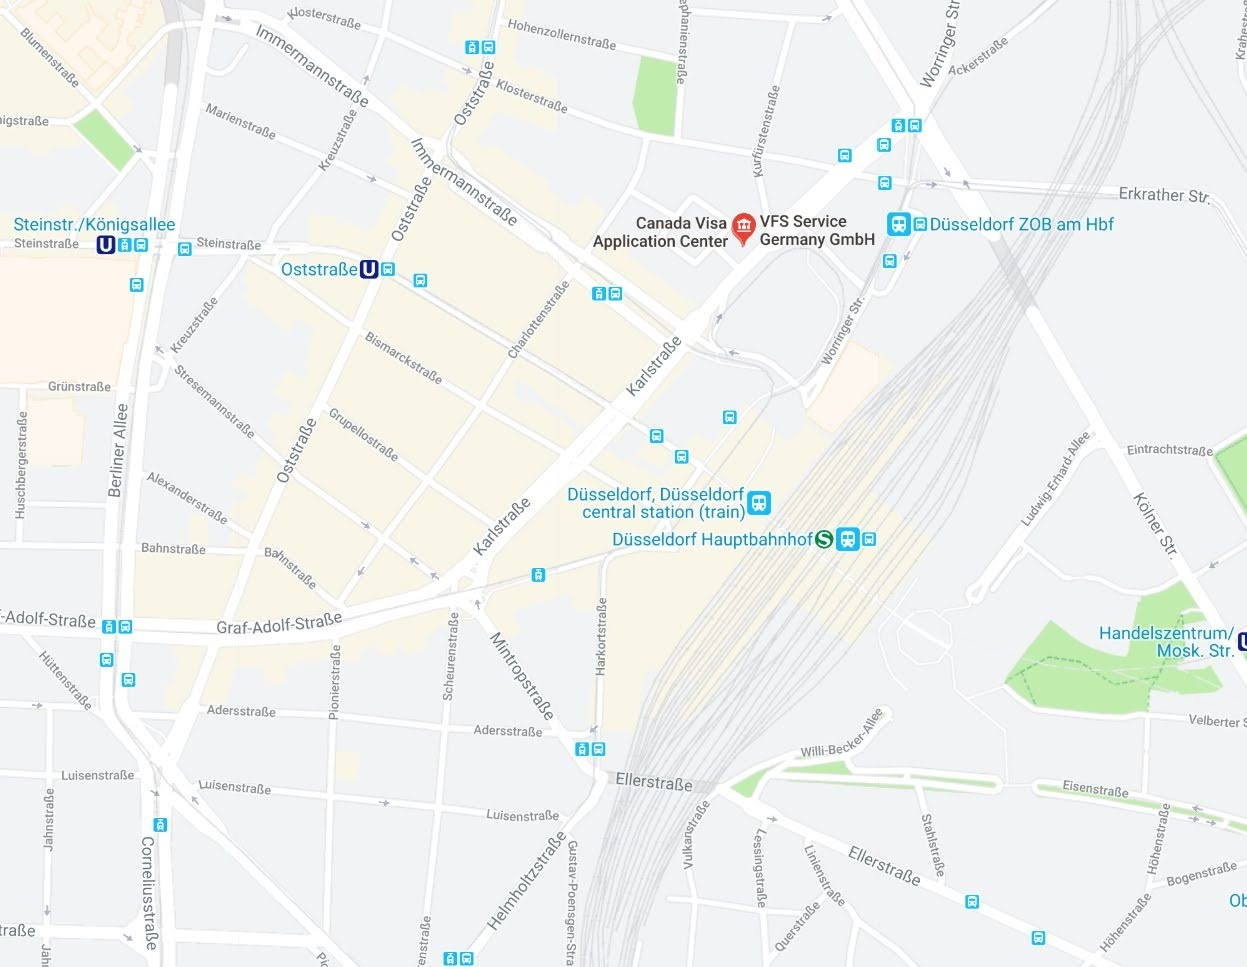 Dusseldorf VAC map